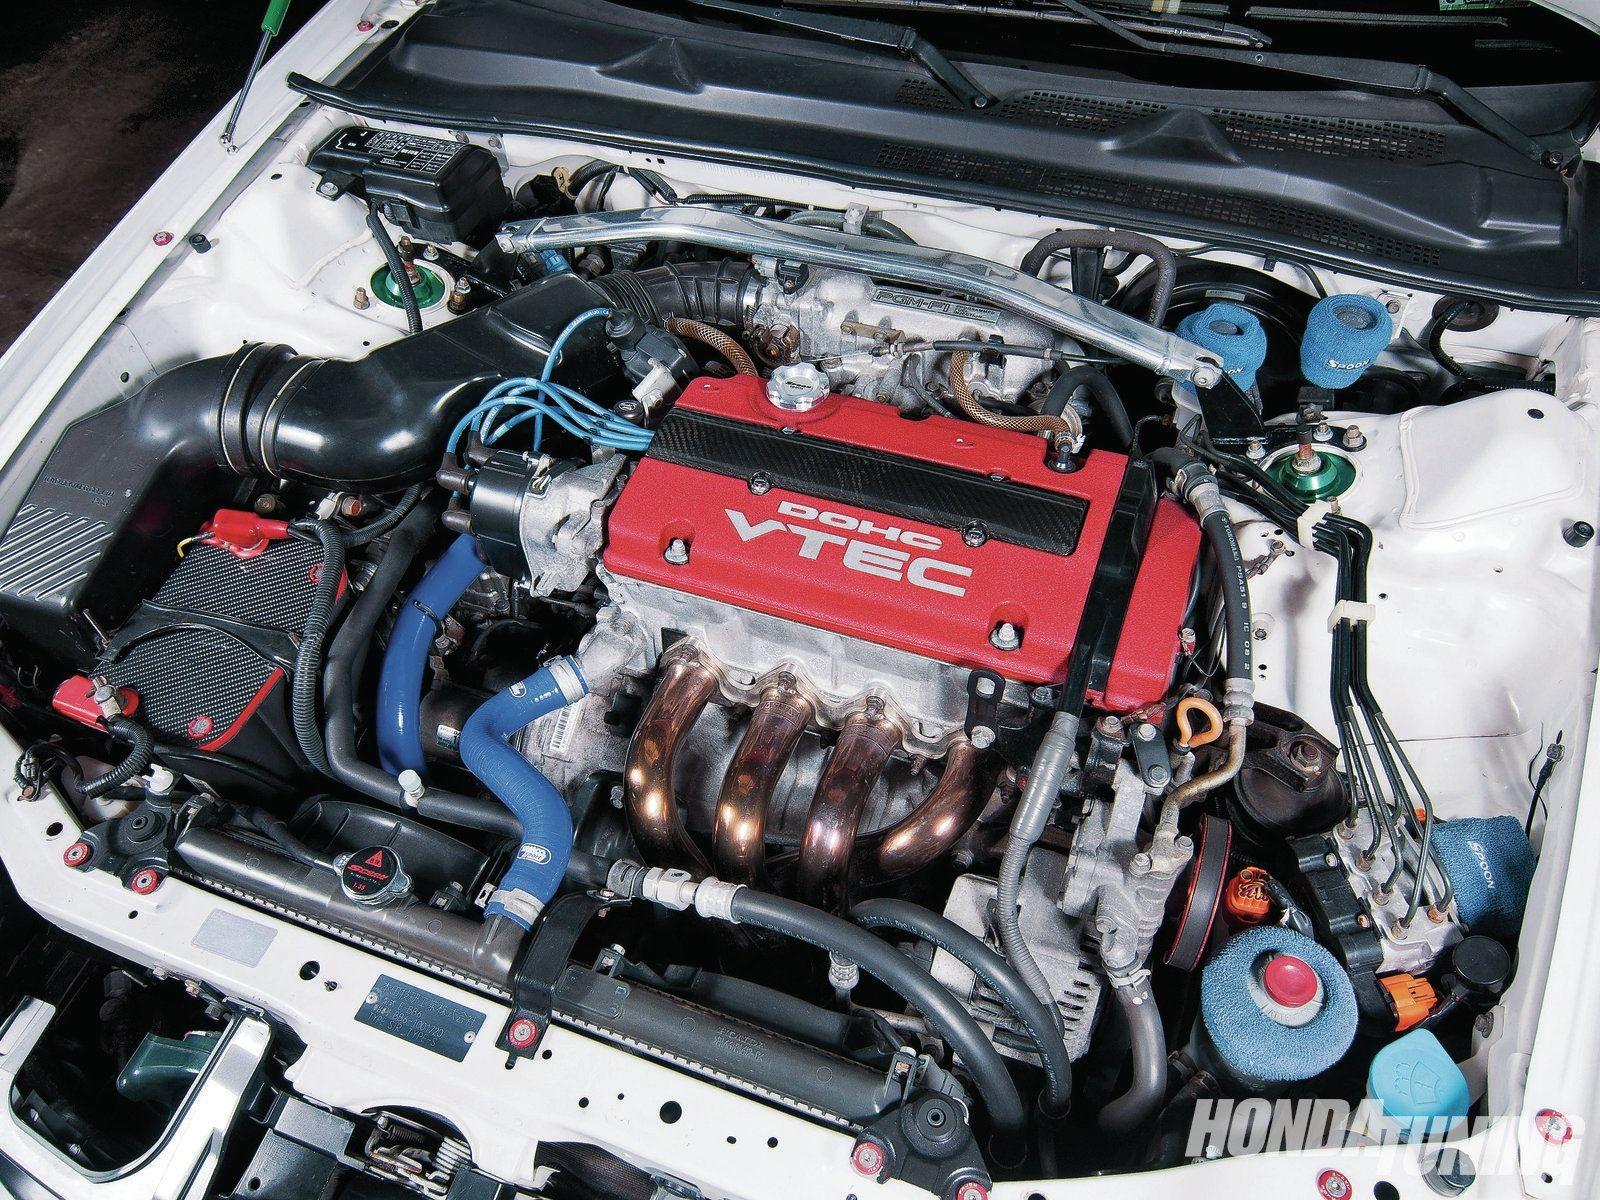 Honda Prelude Engine Diagram 1999 Honda Prelude S Informations Articles  Bestcarmag Of Honda Prelude Engine Diagram